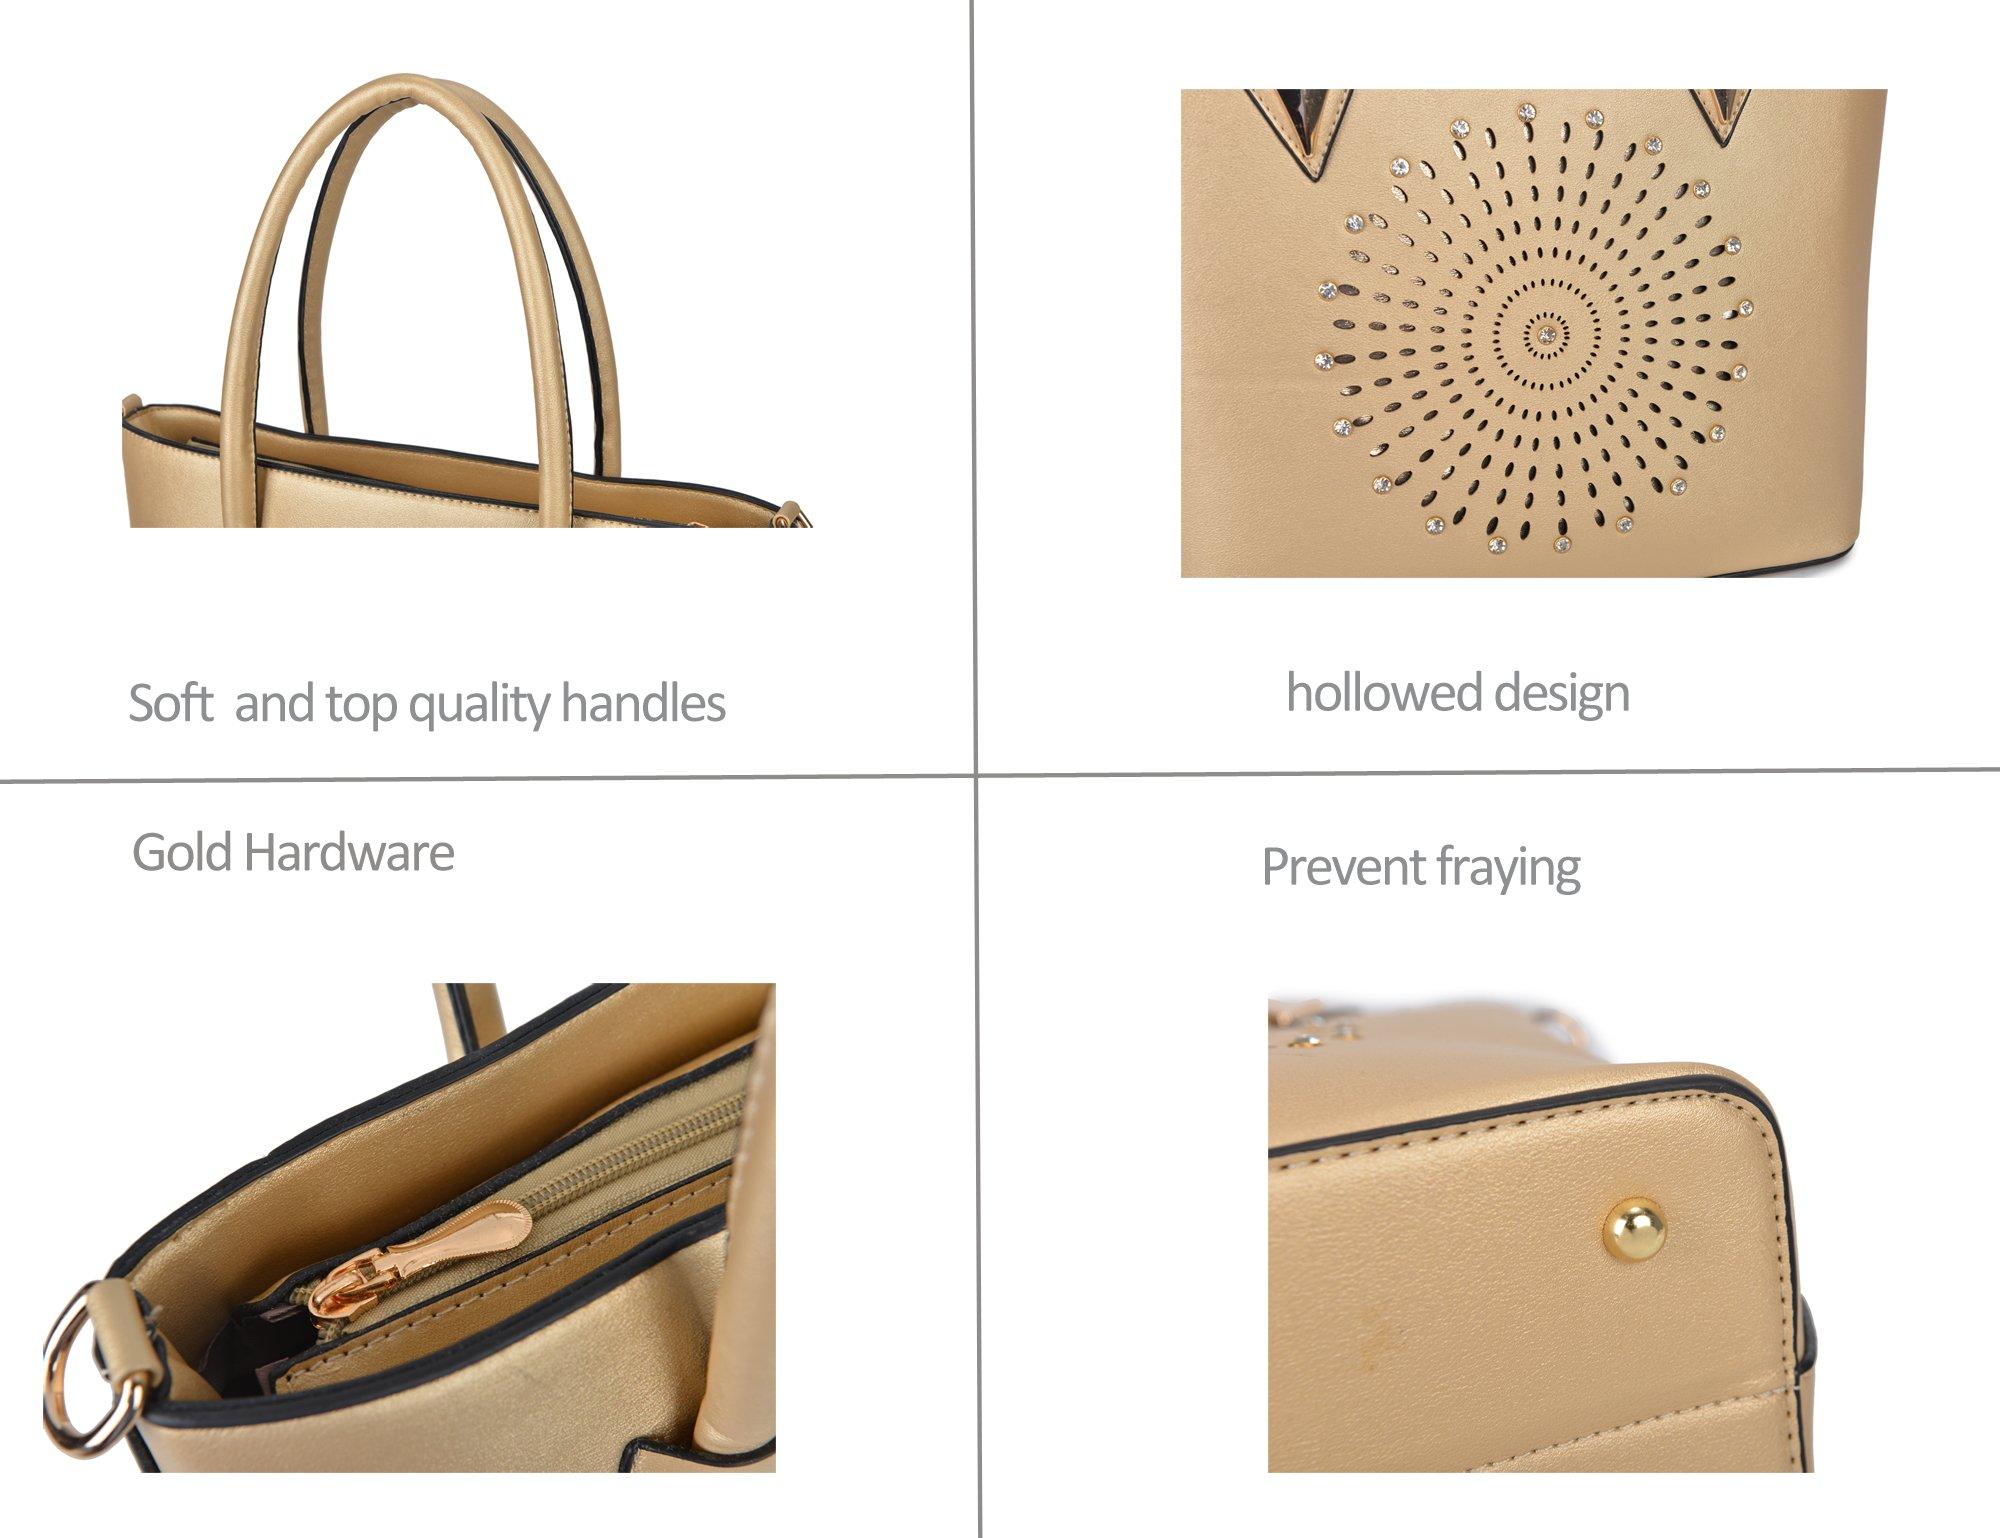 Women Handbag Purse Hobo Faux Leather Messenger Bag Clutch Satchel Bag 3 Piece Gift Set by KasPala (Image #8)